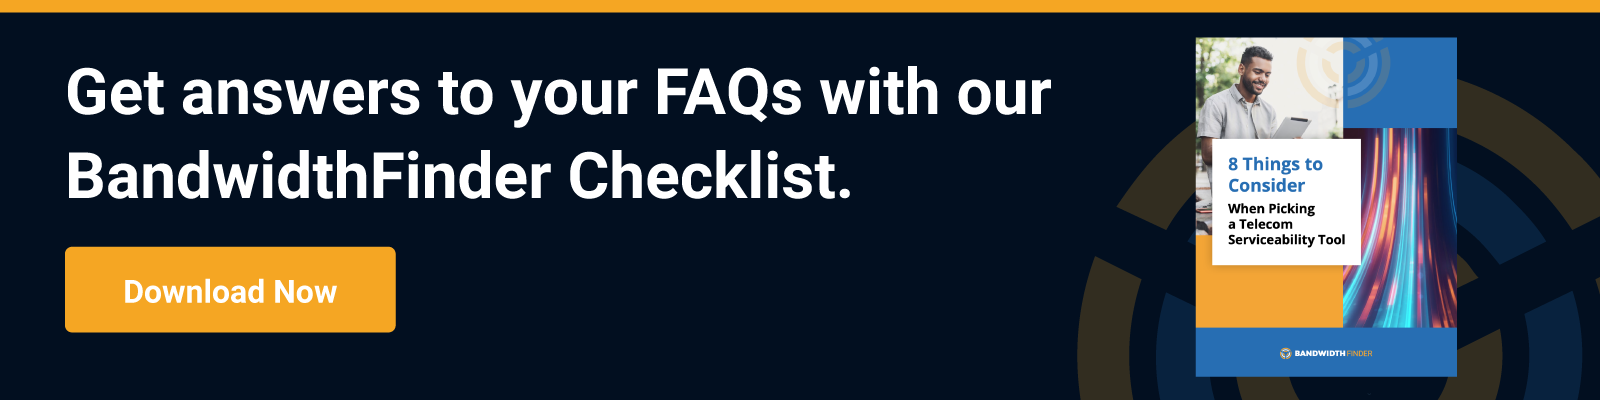 FAQ-Bandwidth-Finder-Checklist